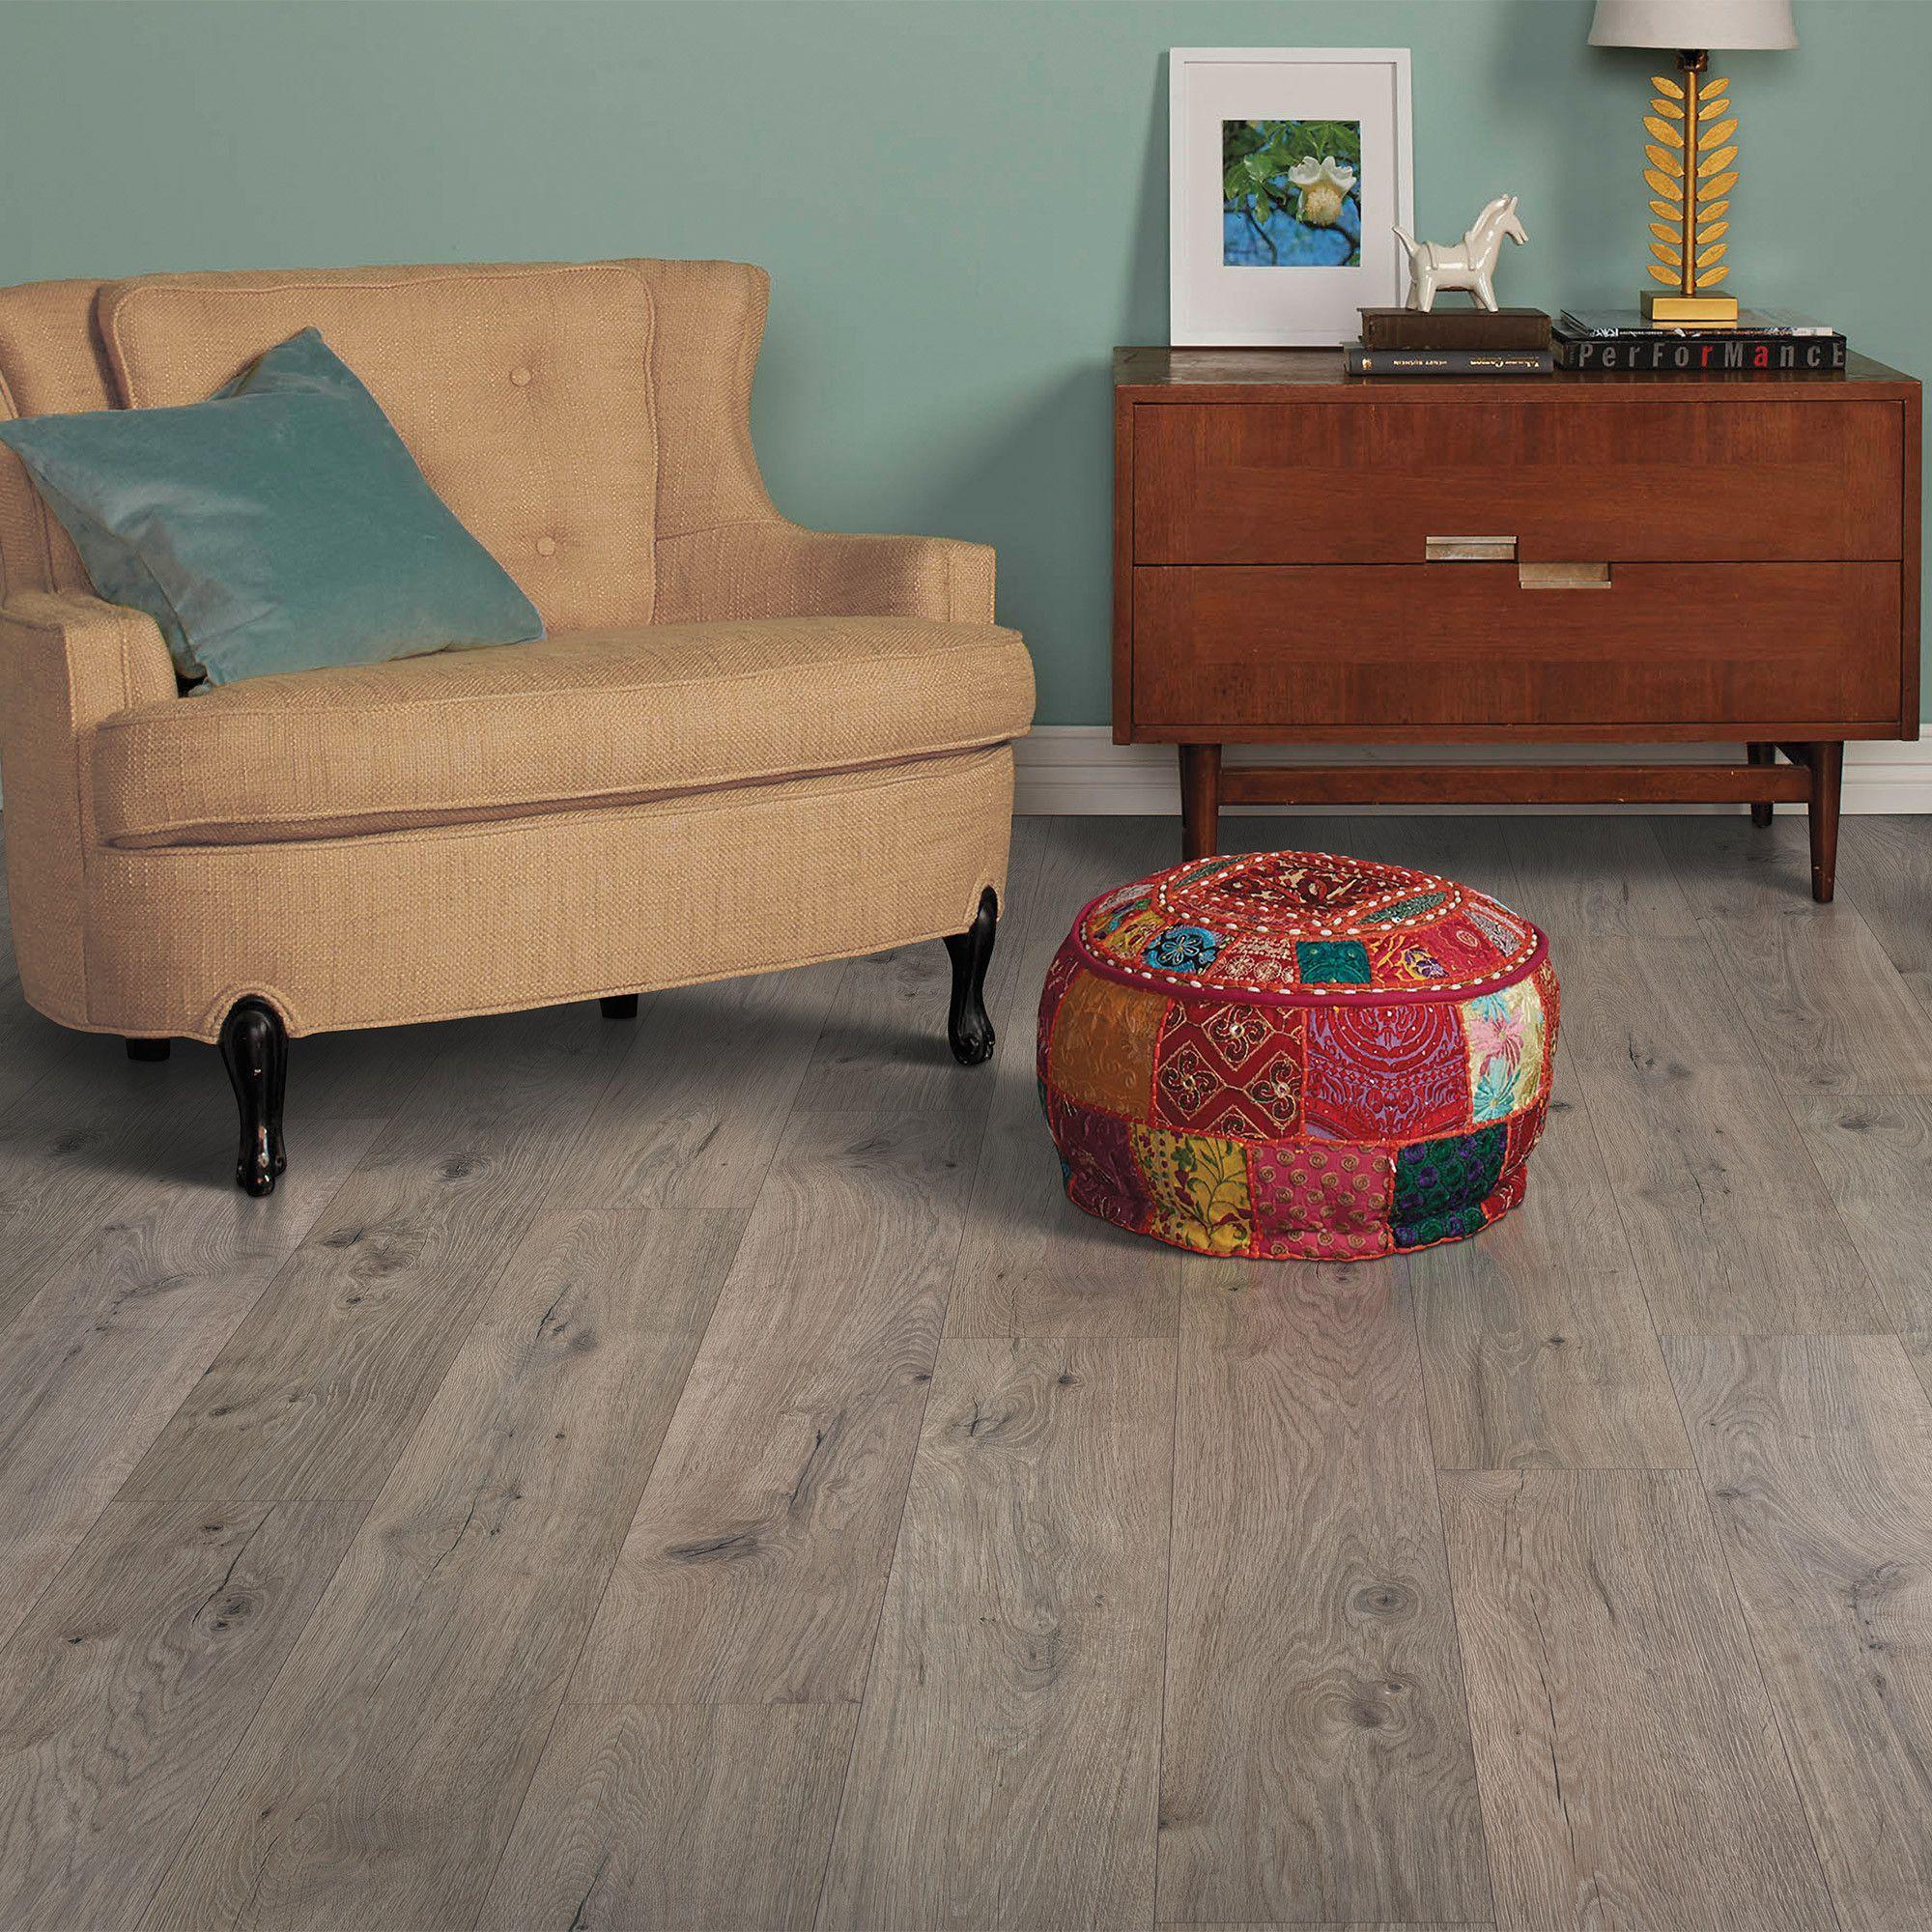 Harmonics camden oak laminate flooring 2015 sq ft per box harmonics silverleaf oak laminate flooring 2208 sq ft per box dailygadgetfo Gallery